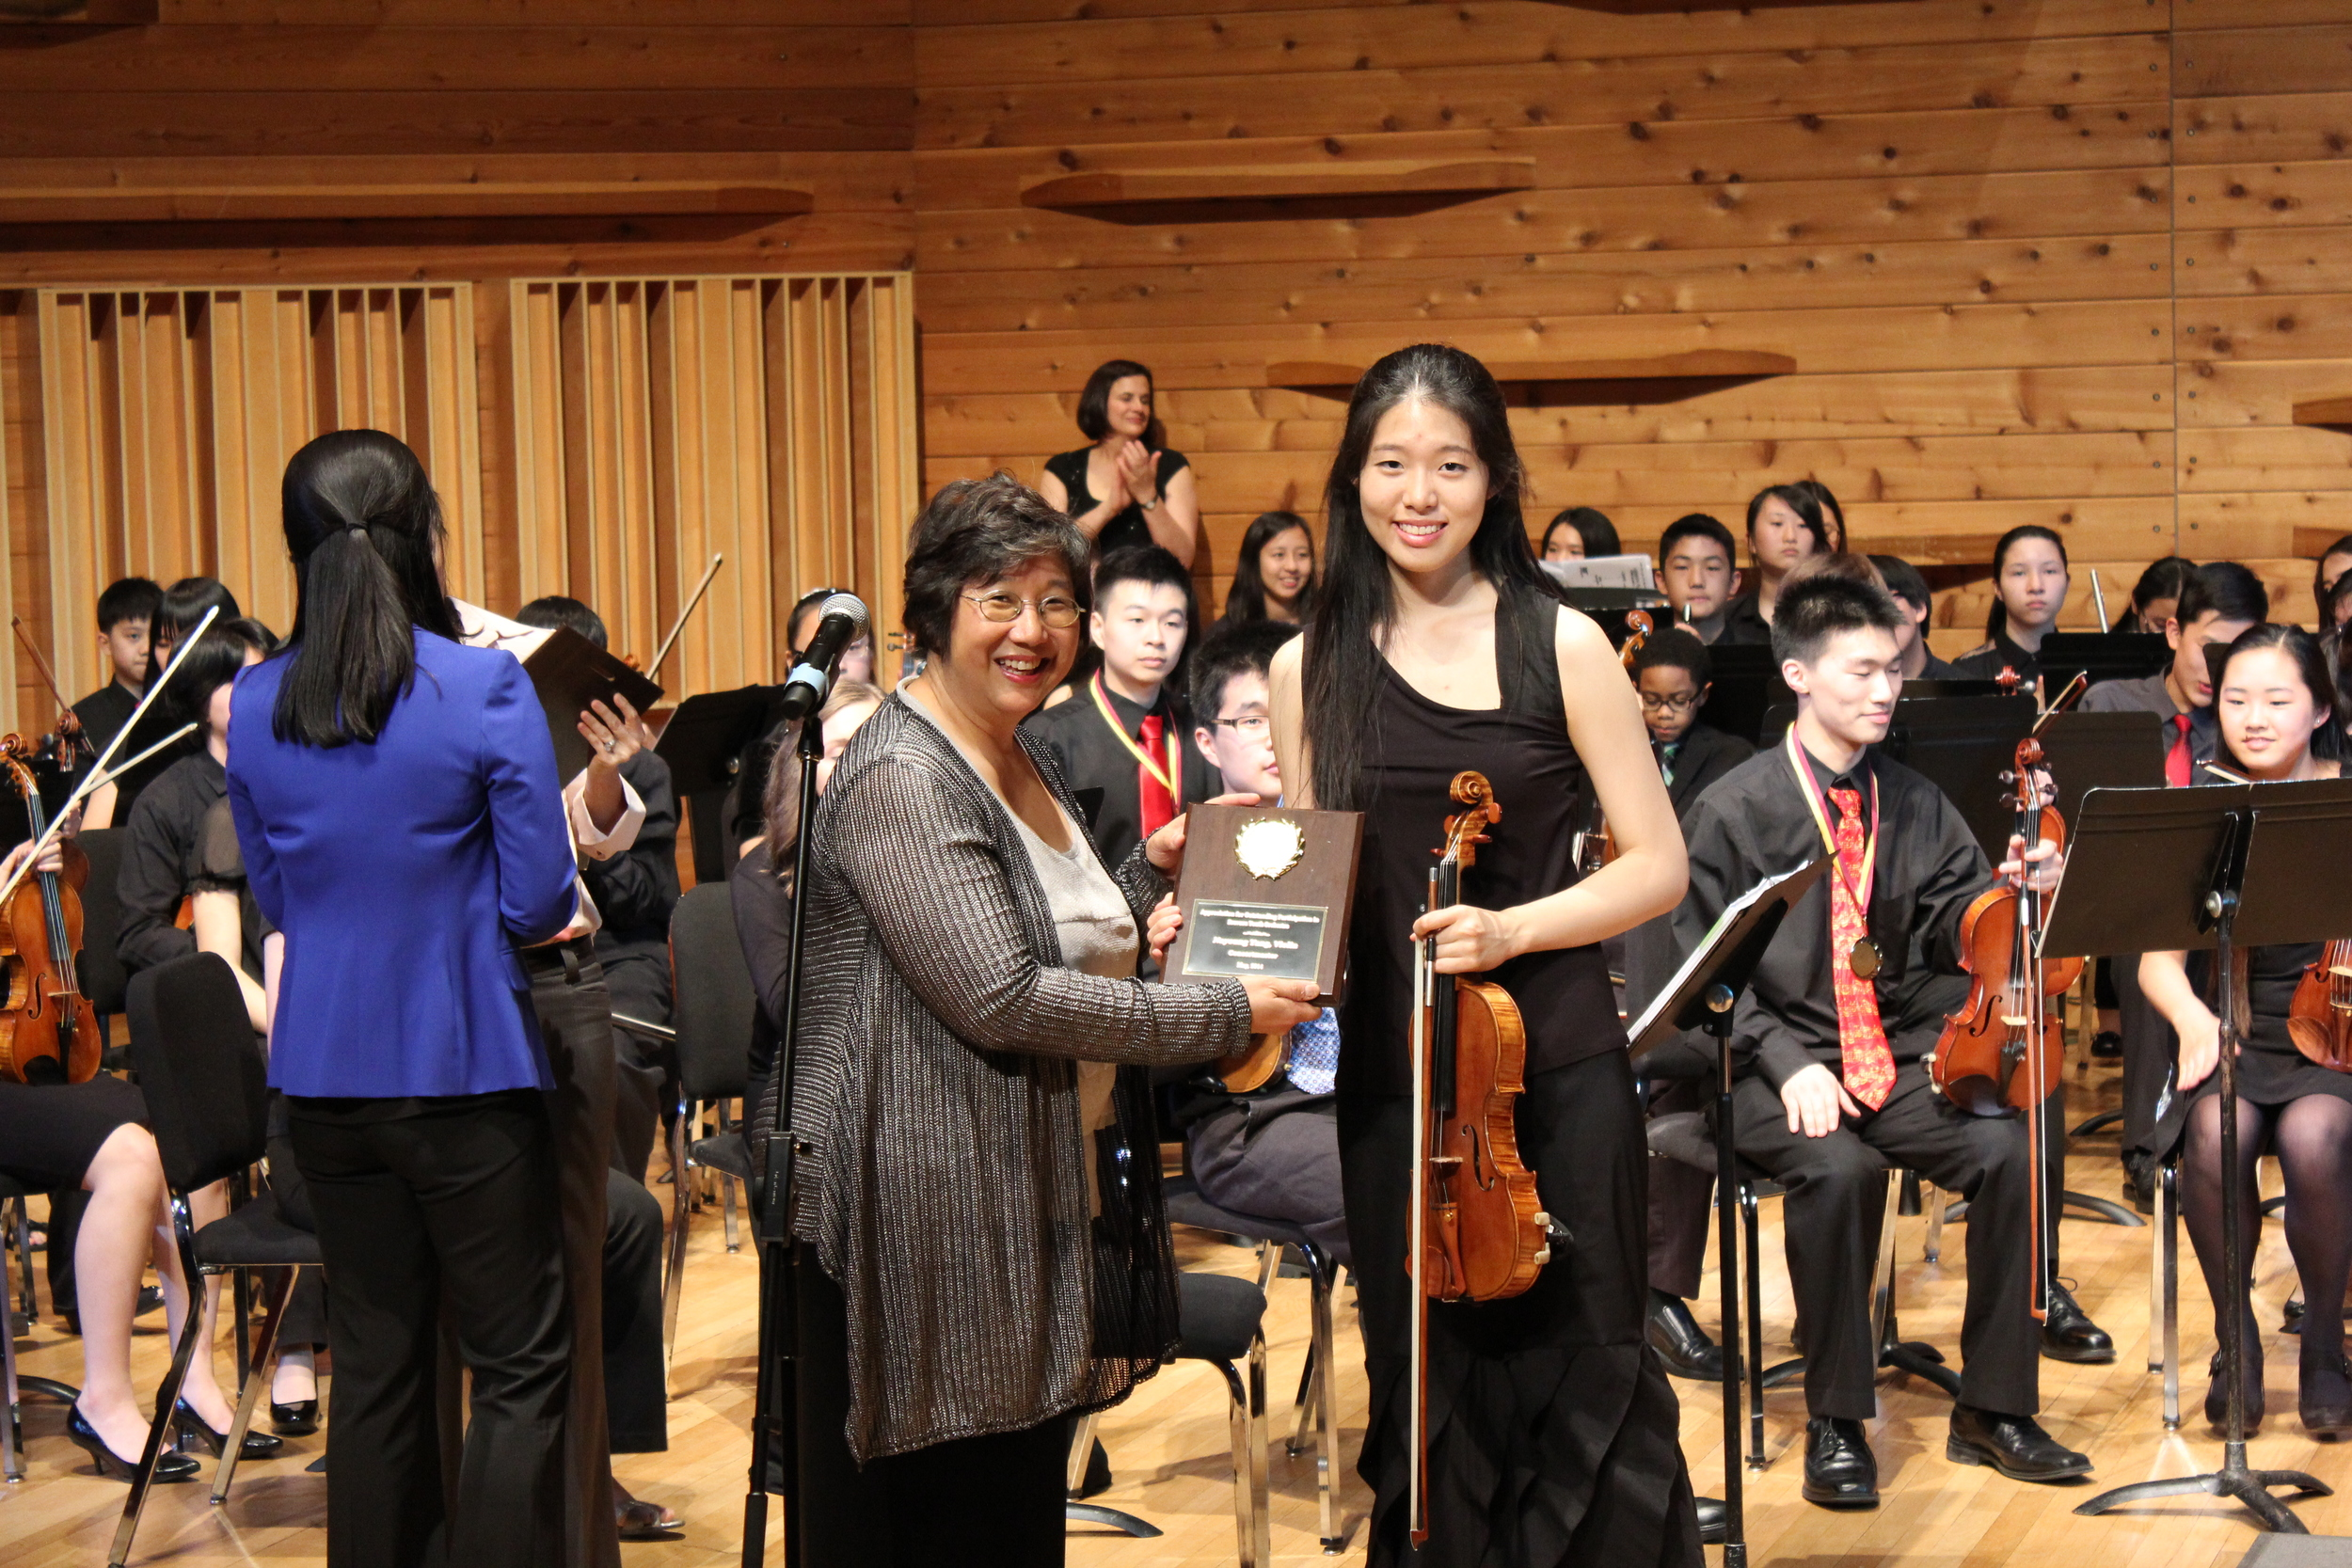 Acknowledging Nayoung Yang, concertmaster 2012-2014